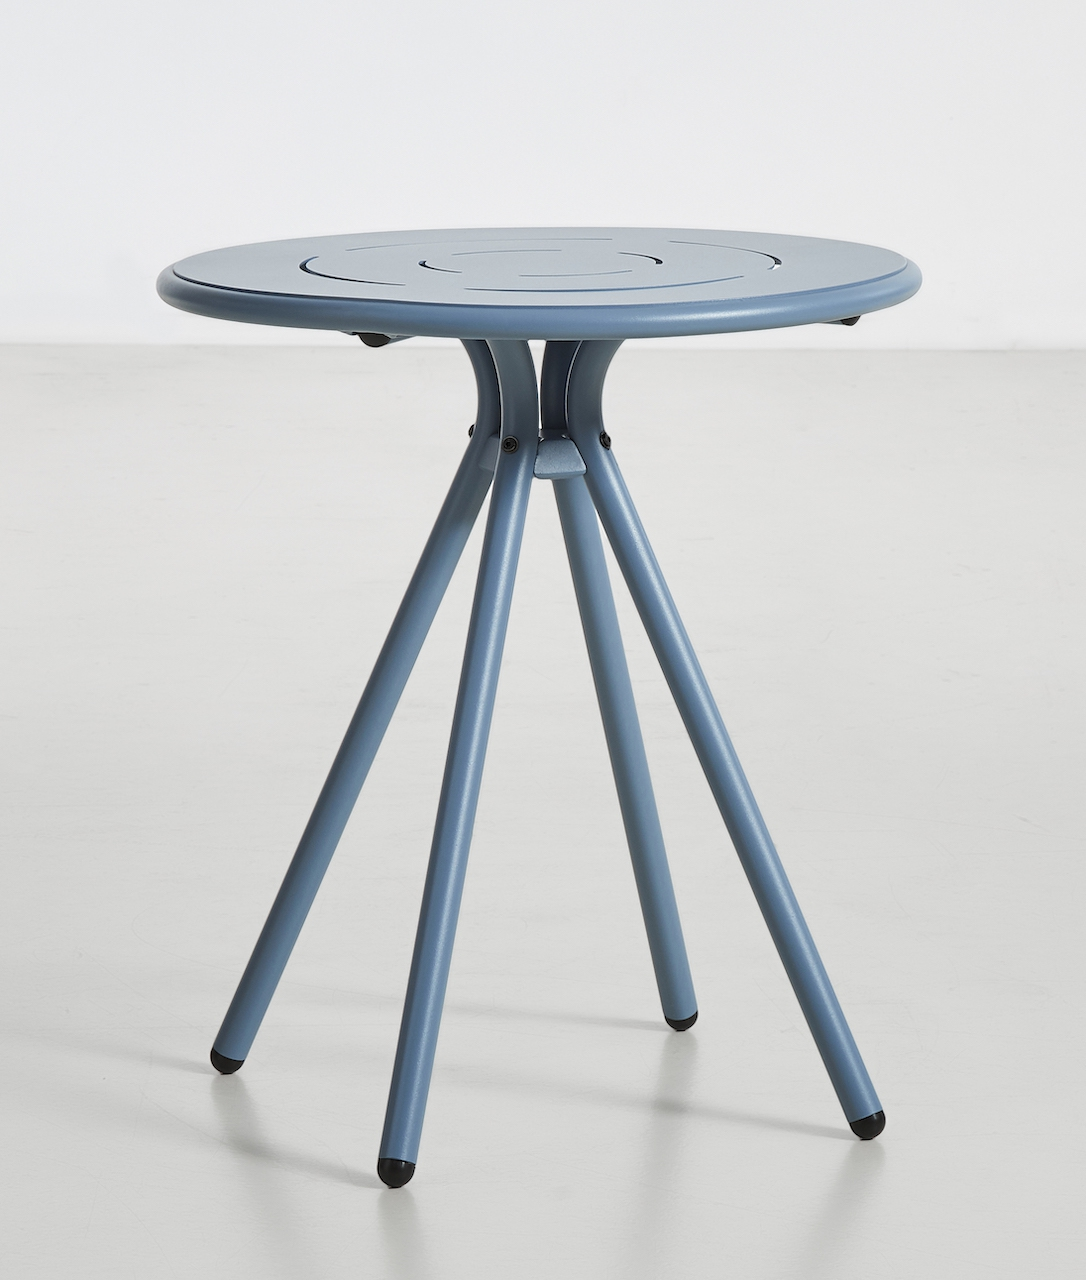 Woud Ray Café Table rund blau